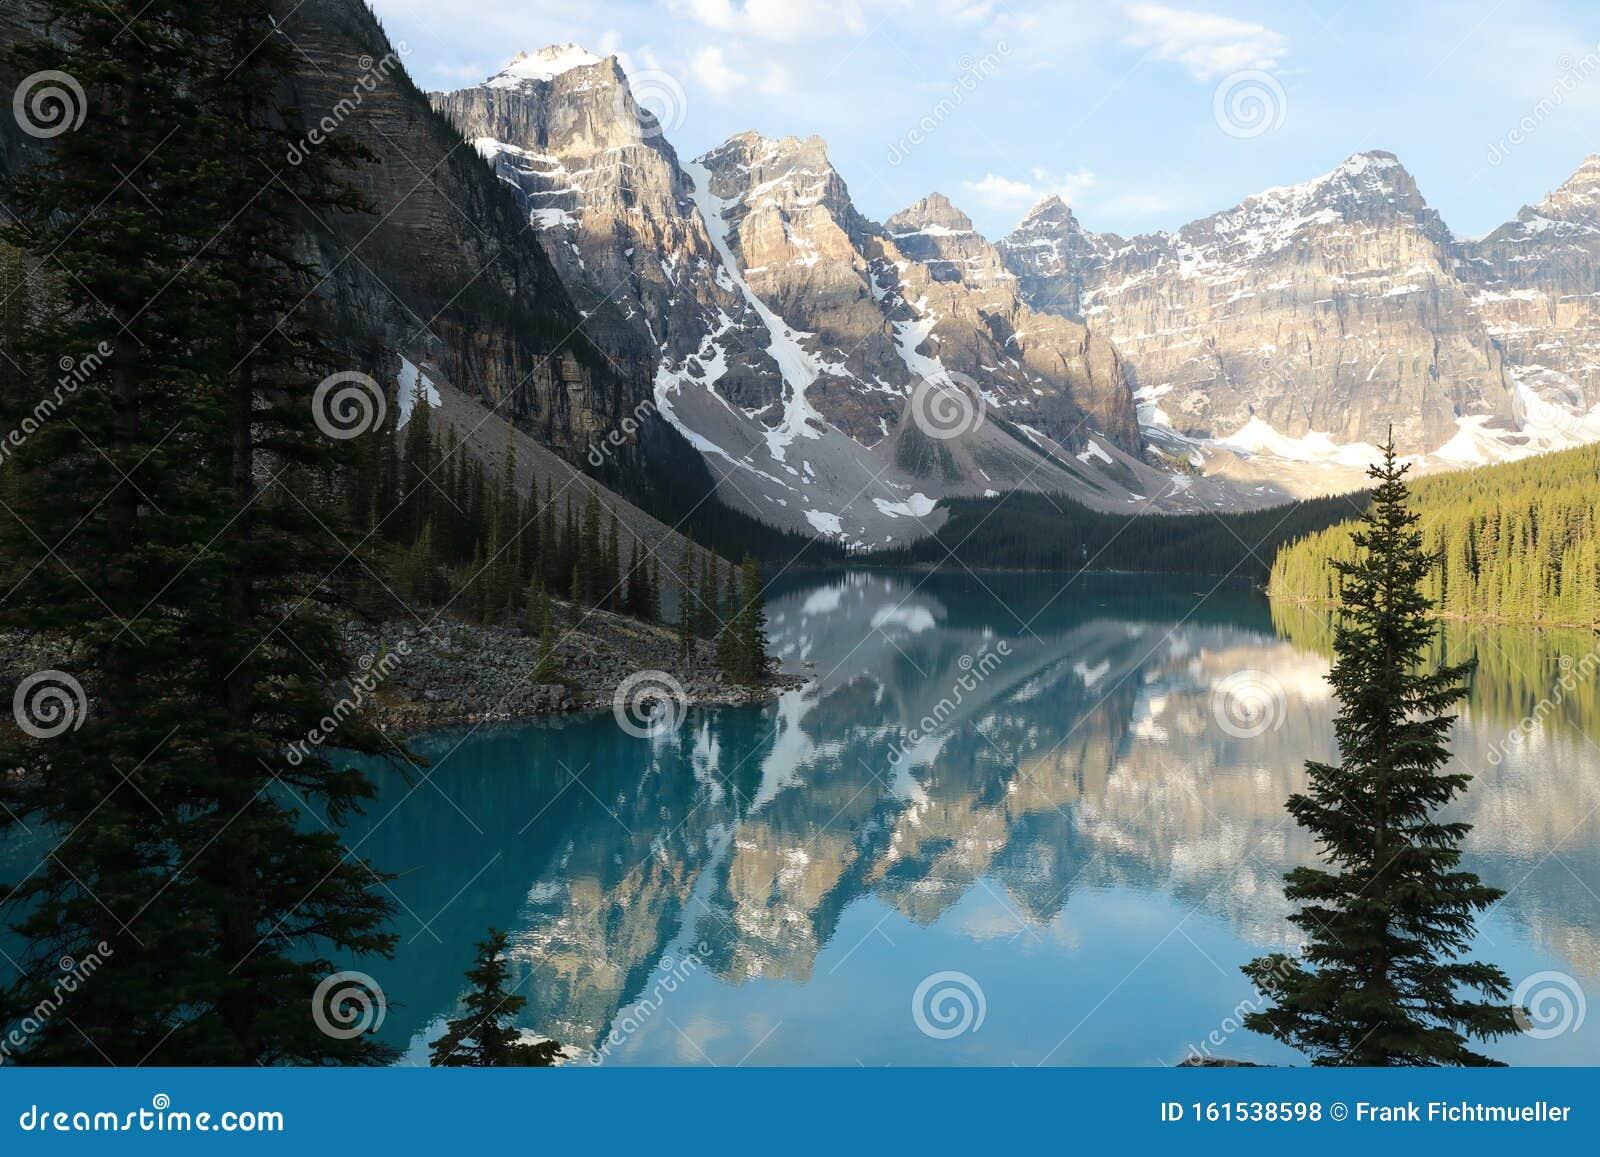 Moraine Lake In Banff National Park Alberta Canada Stock